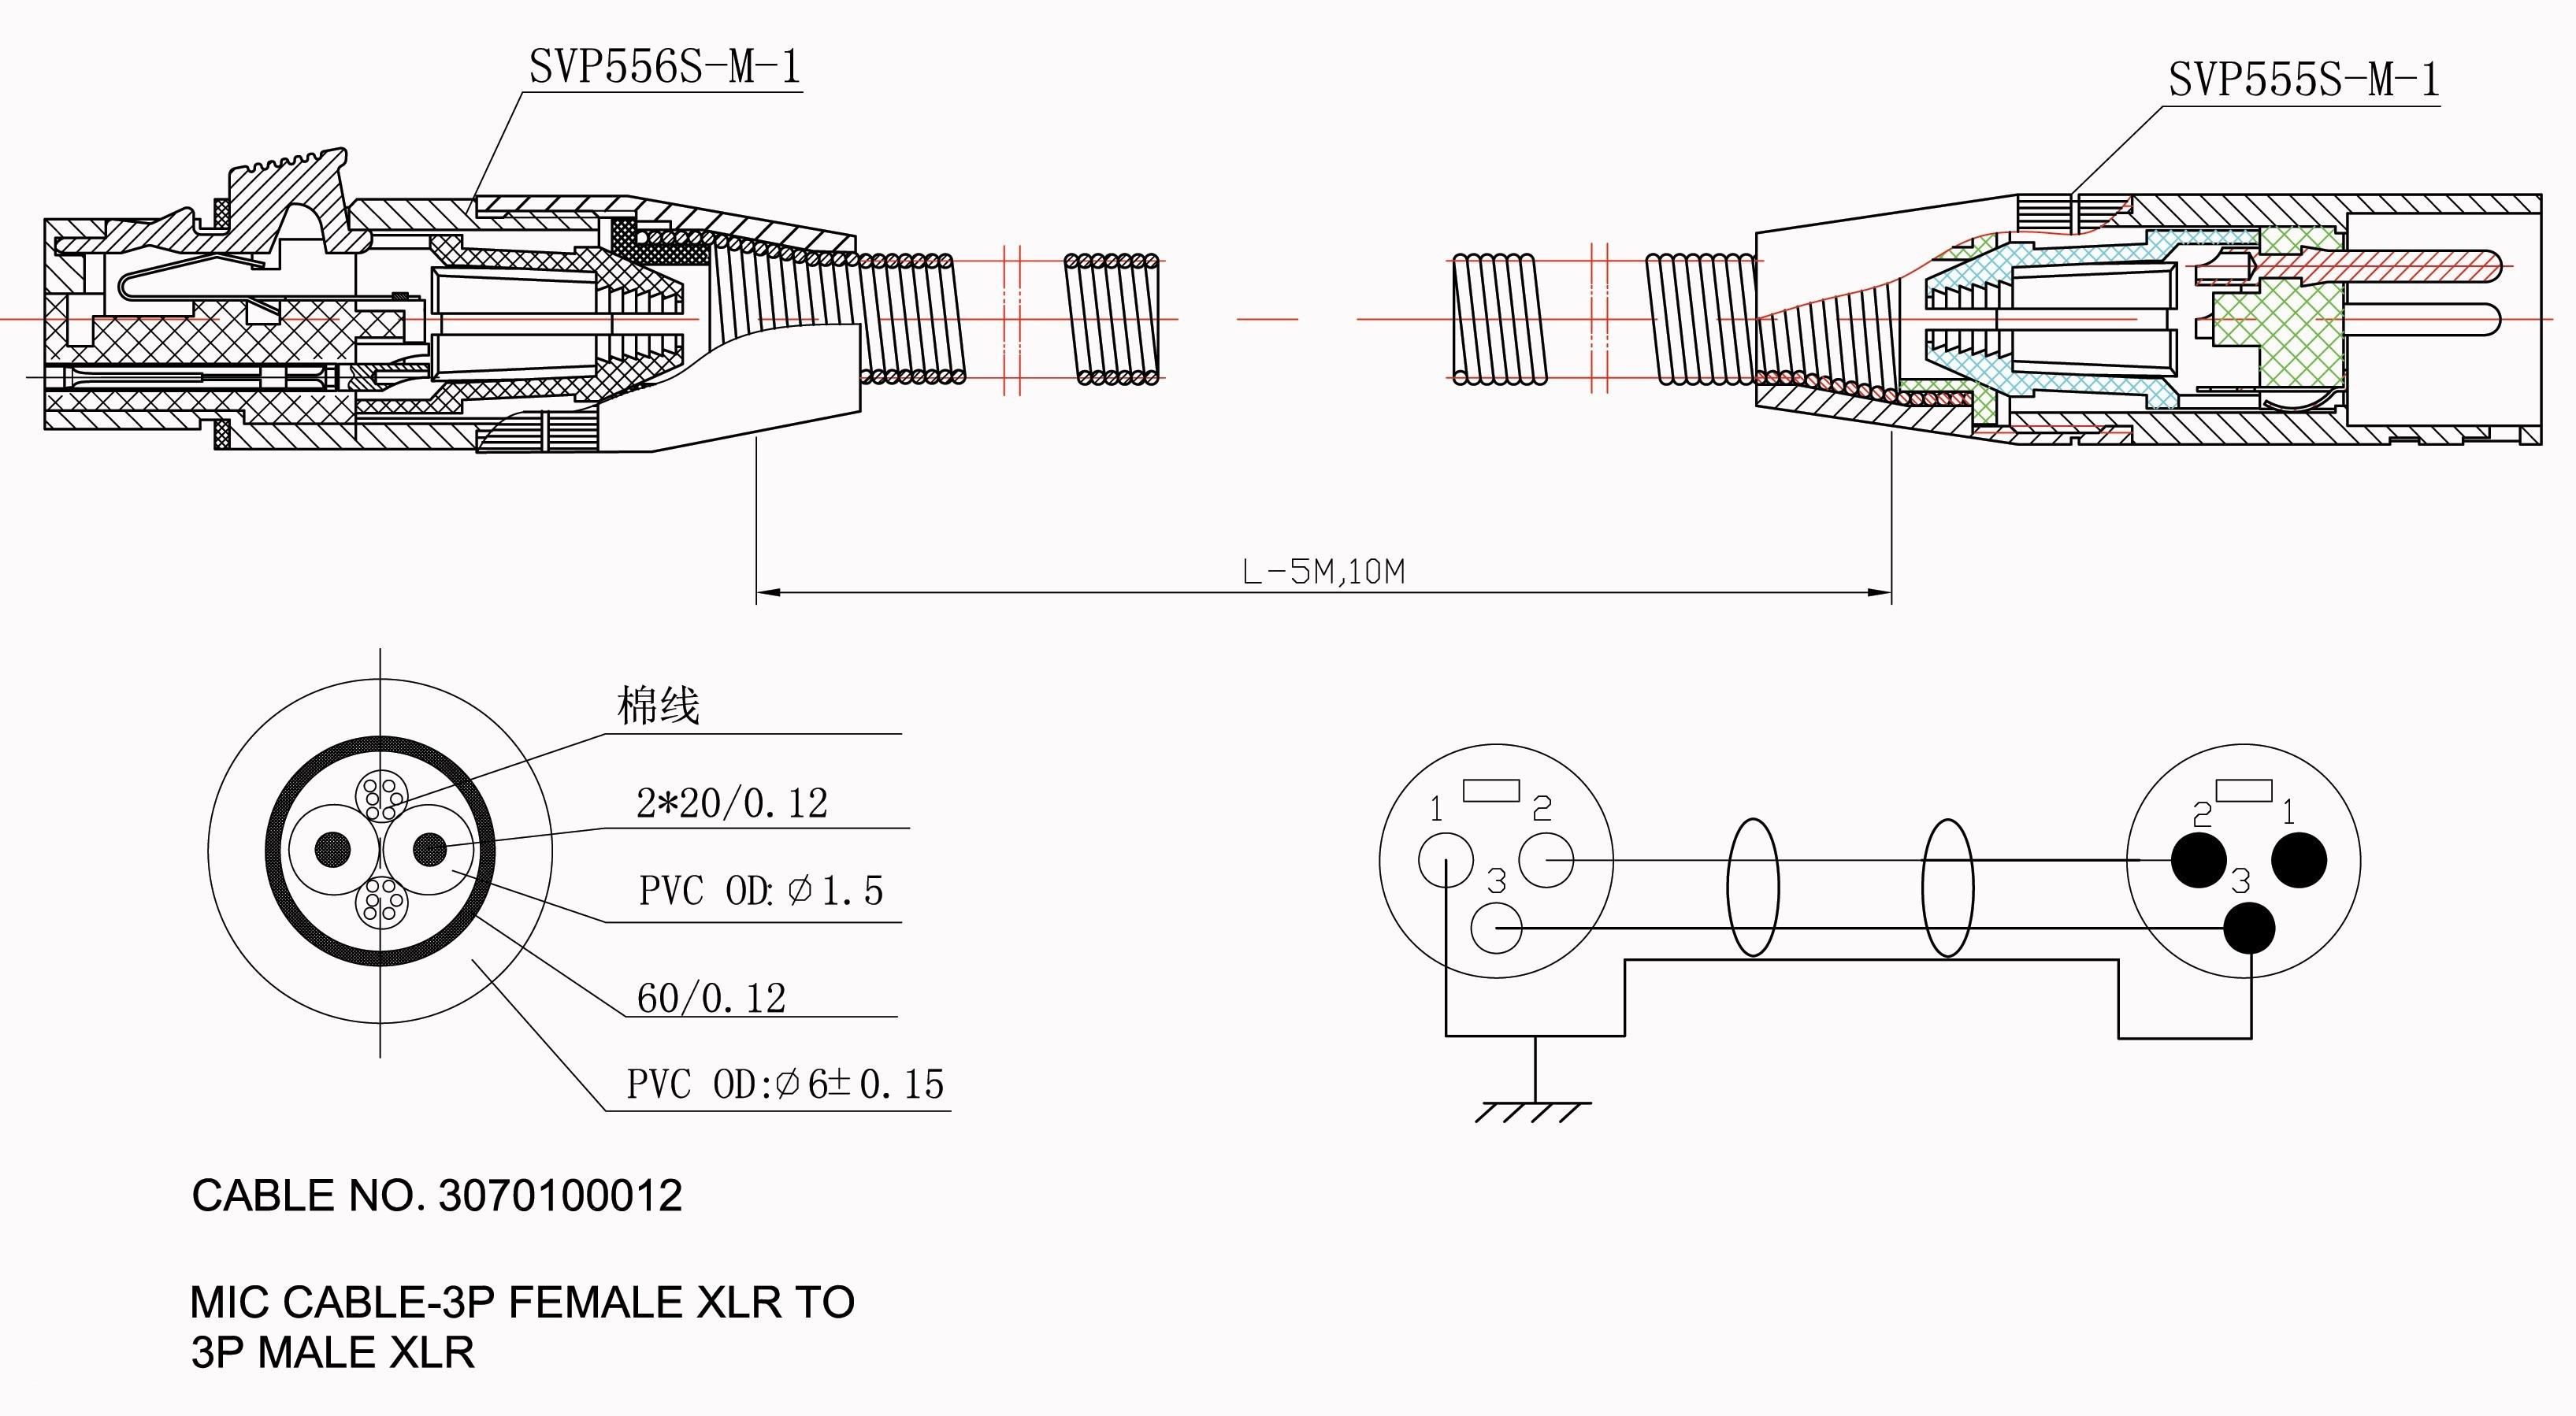 Car Amplifier Wiring Diagram 6 Channel Car Amplifier Wiring Diagram New Wiring Diagram Car Of Car Amplifier Wiring Diagram Wiring Diagram Car Audio Amplifier Valid Car Audio Wiring Diagrams